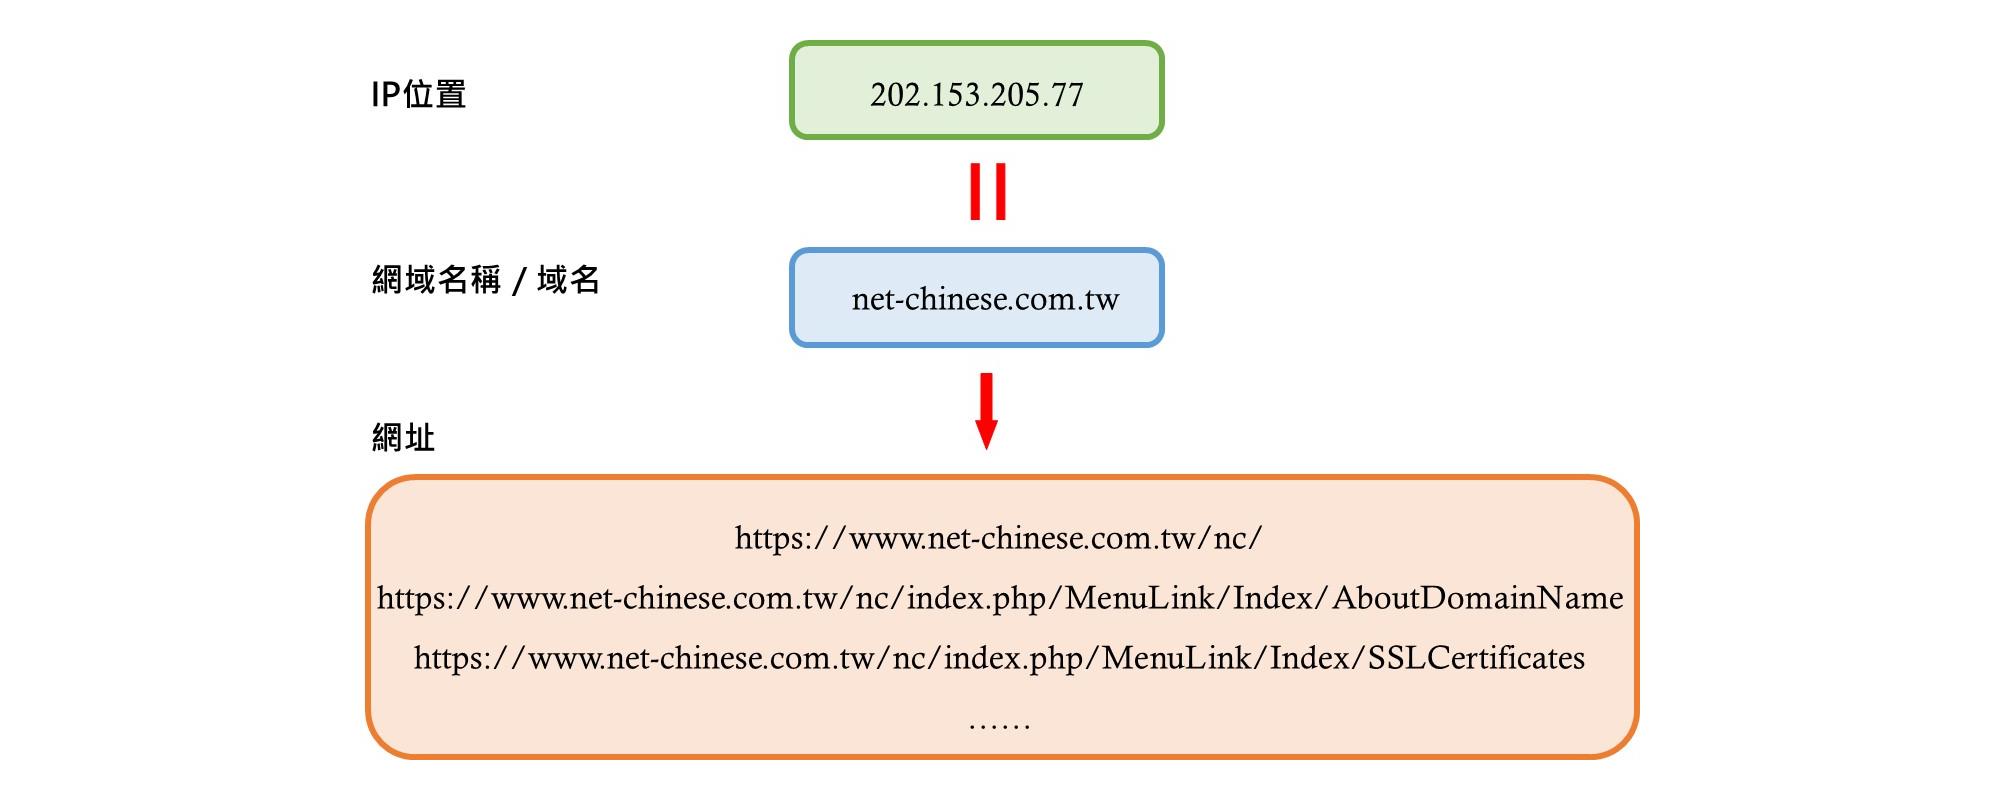 IP、網域、域名、網址